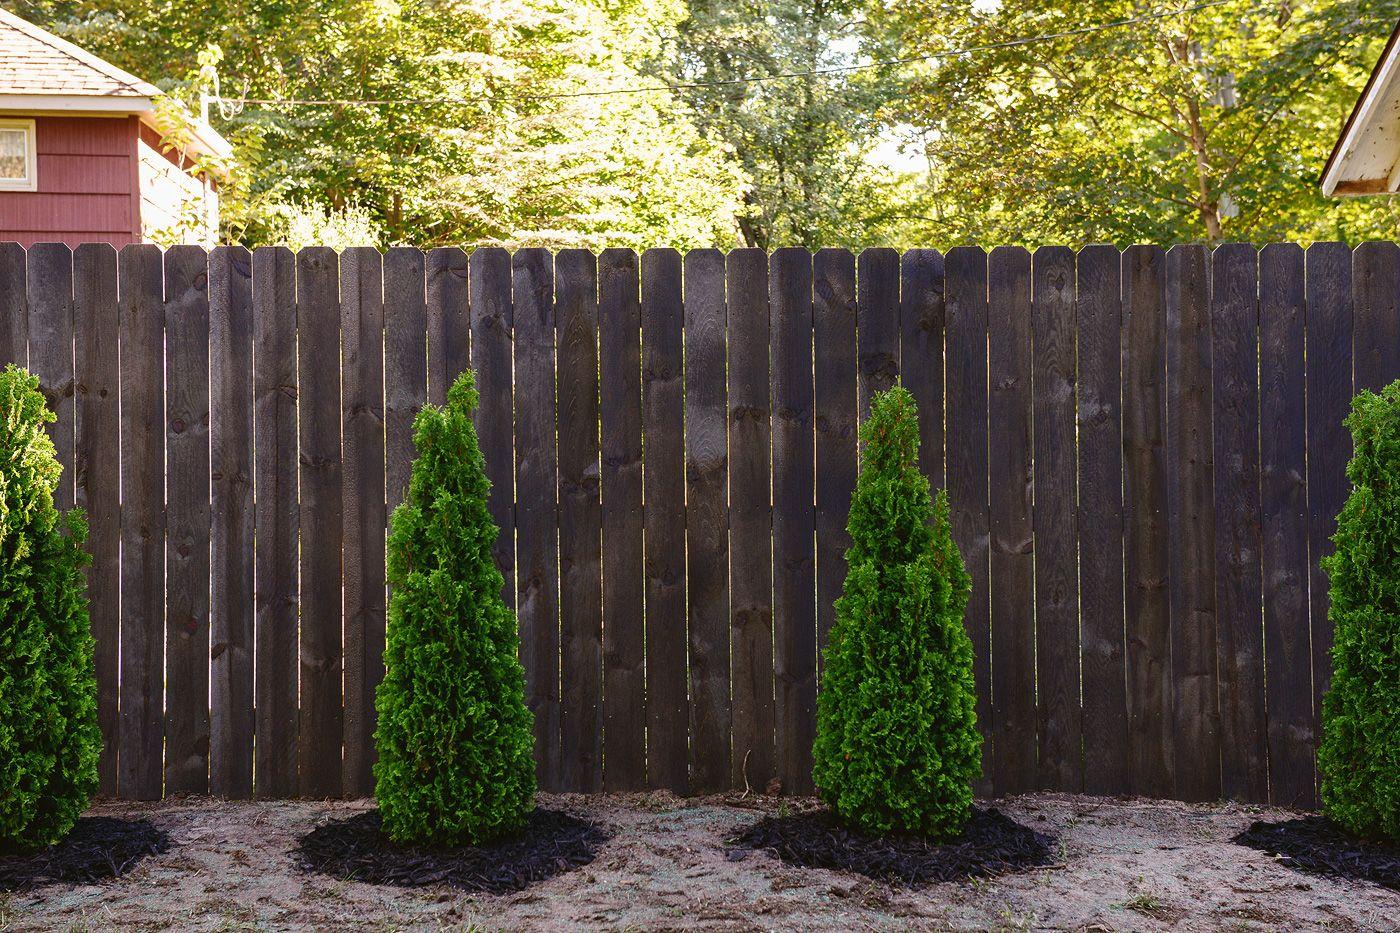 Staining Our Fence Black Staining Wood Fence Backyard Fences Wood Fence